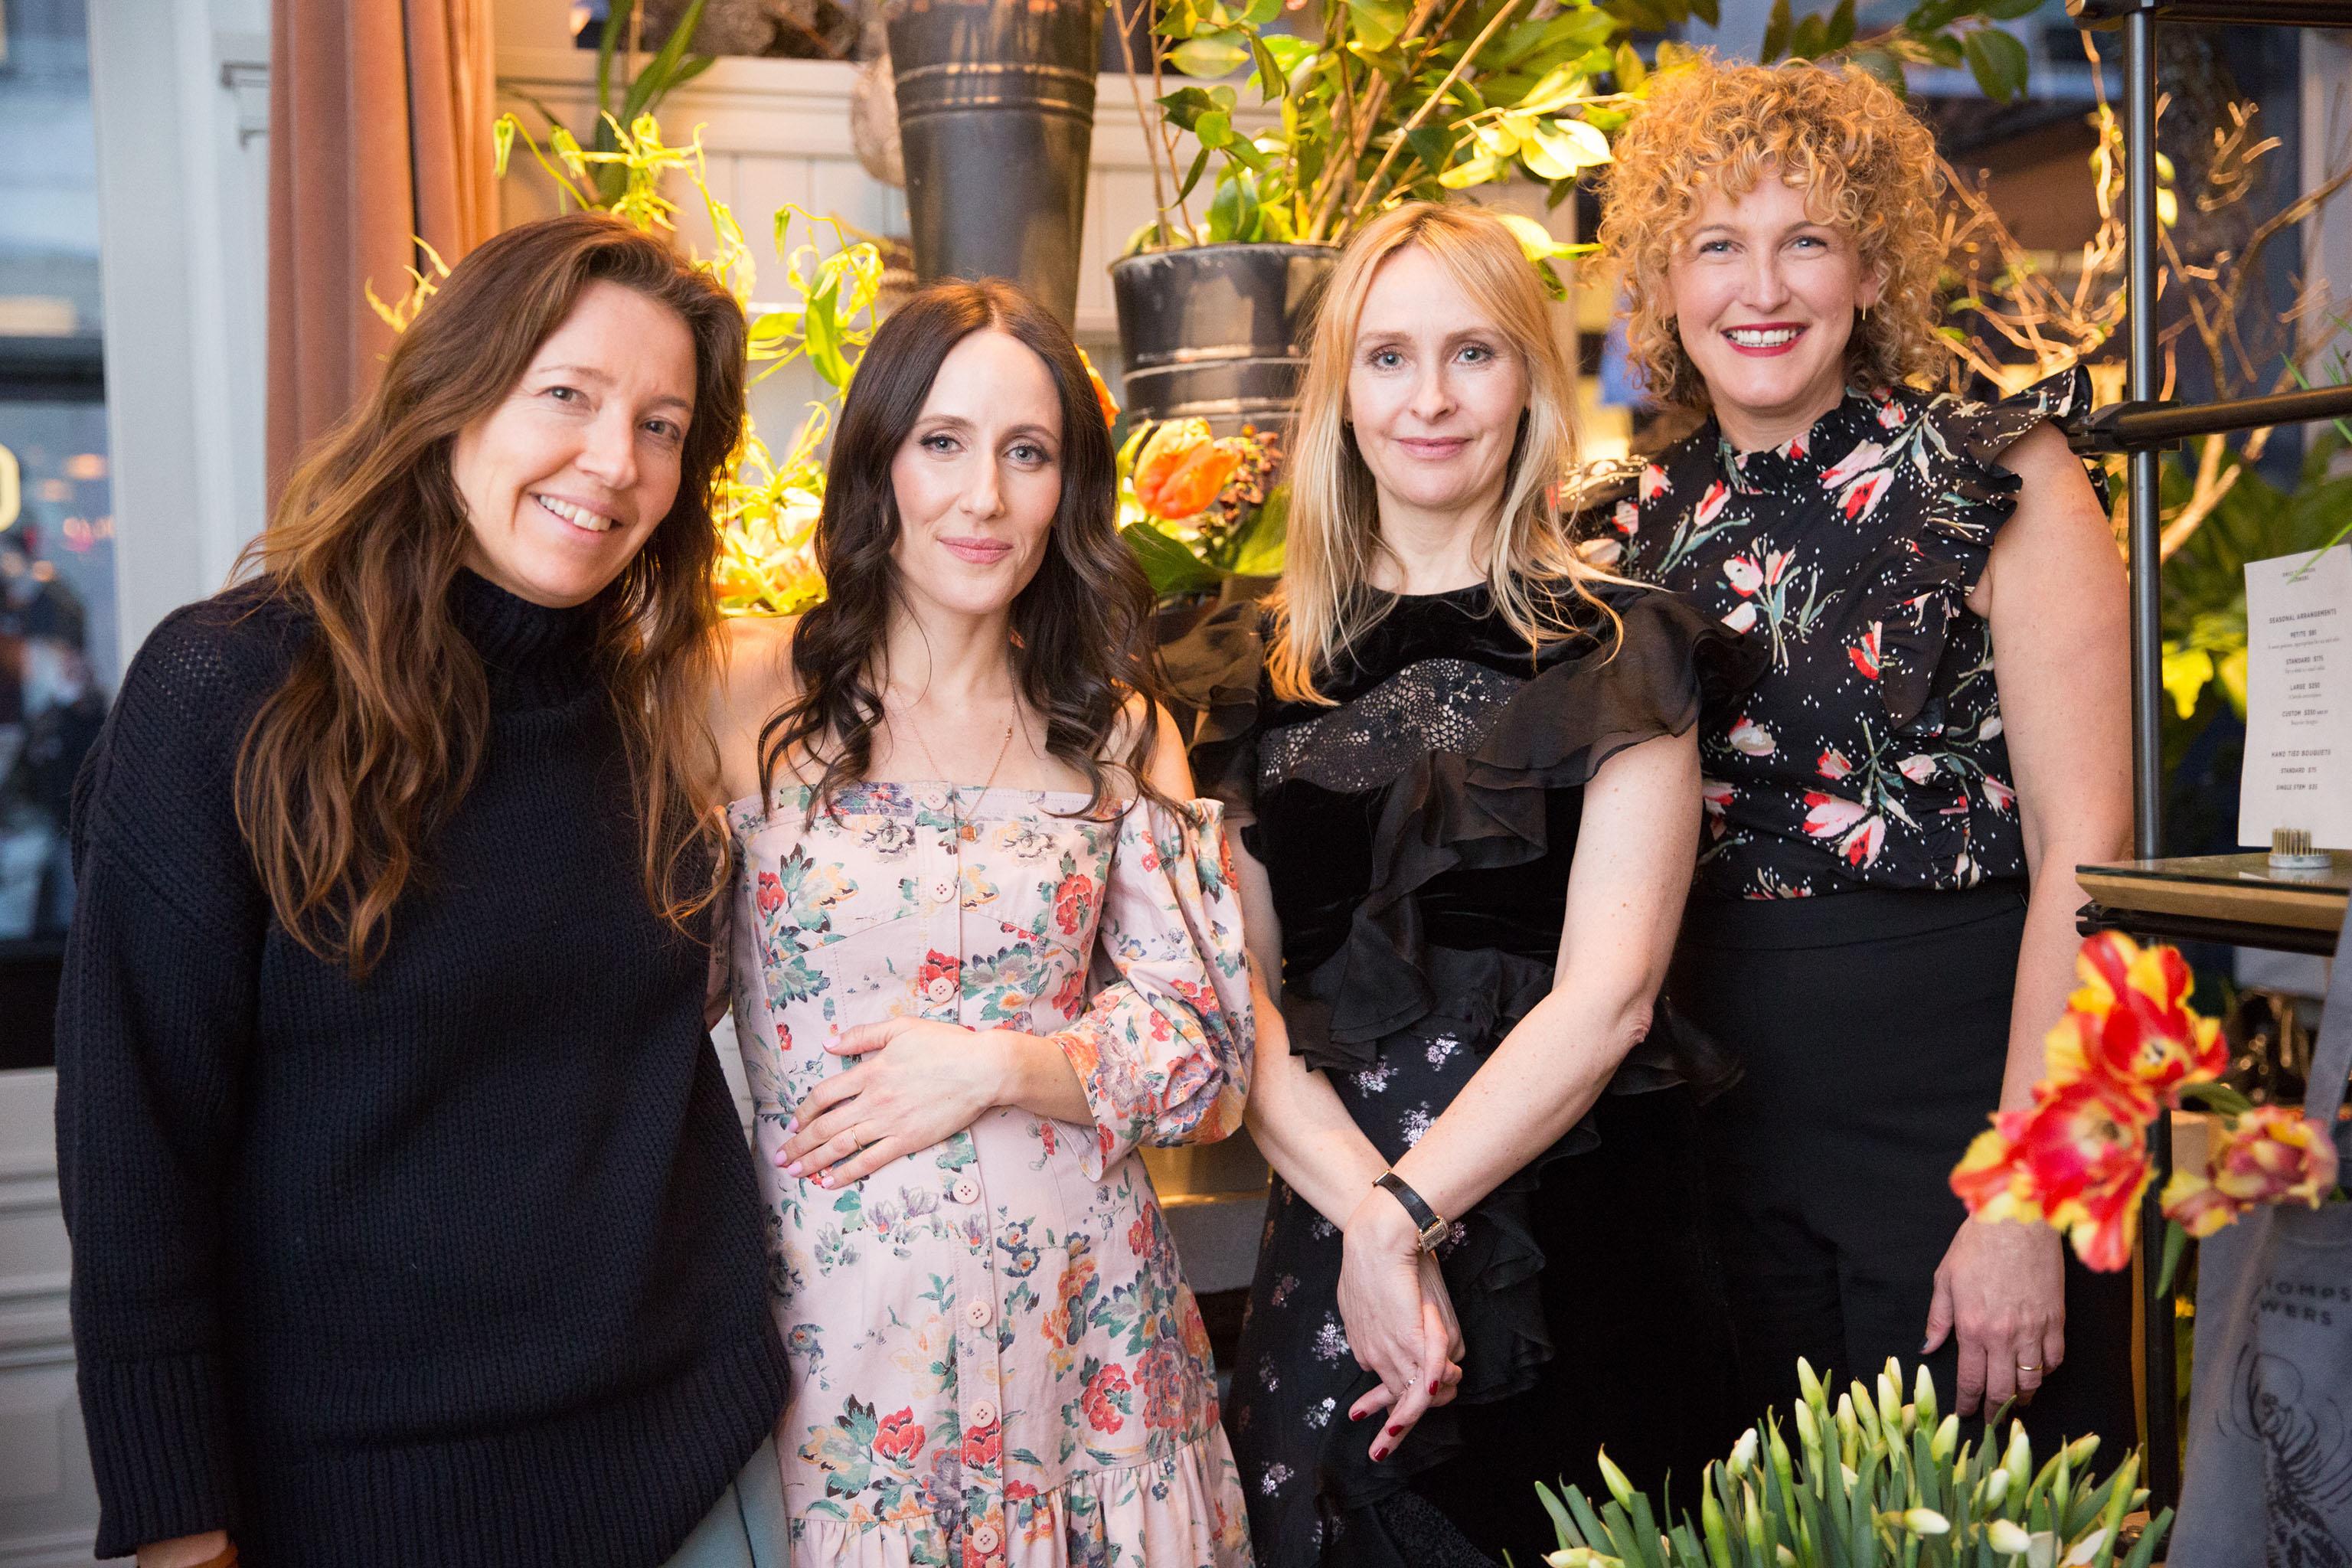 Jean Godfrey June, Violet Gaynor, Rebecca Taylor and Erin Loos Cutrano